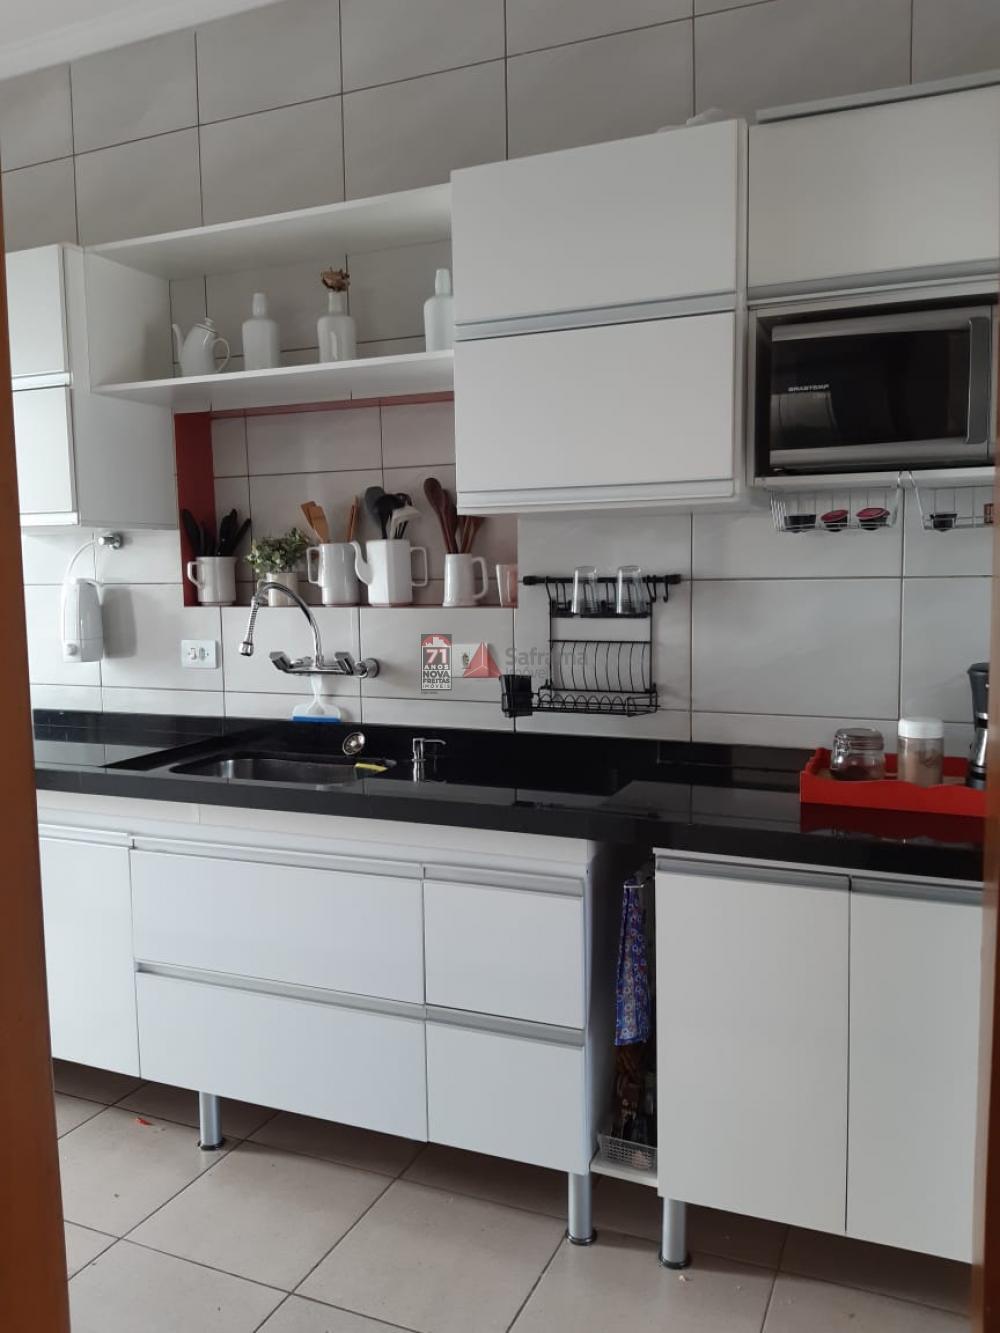 Comprar Casa / Padrão em Pindamonhangaba R$ 350.000,00 - Foto 12